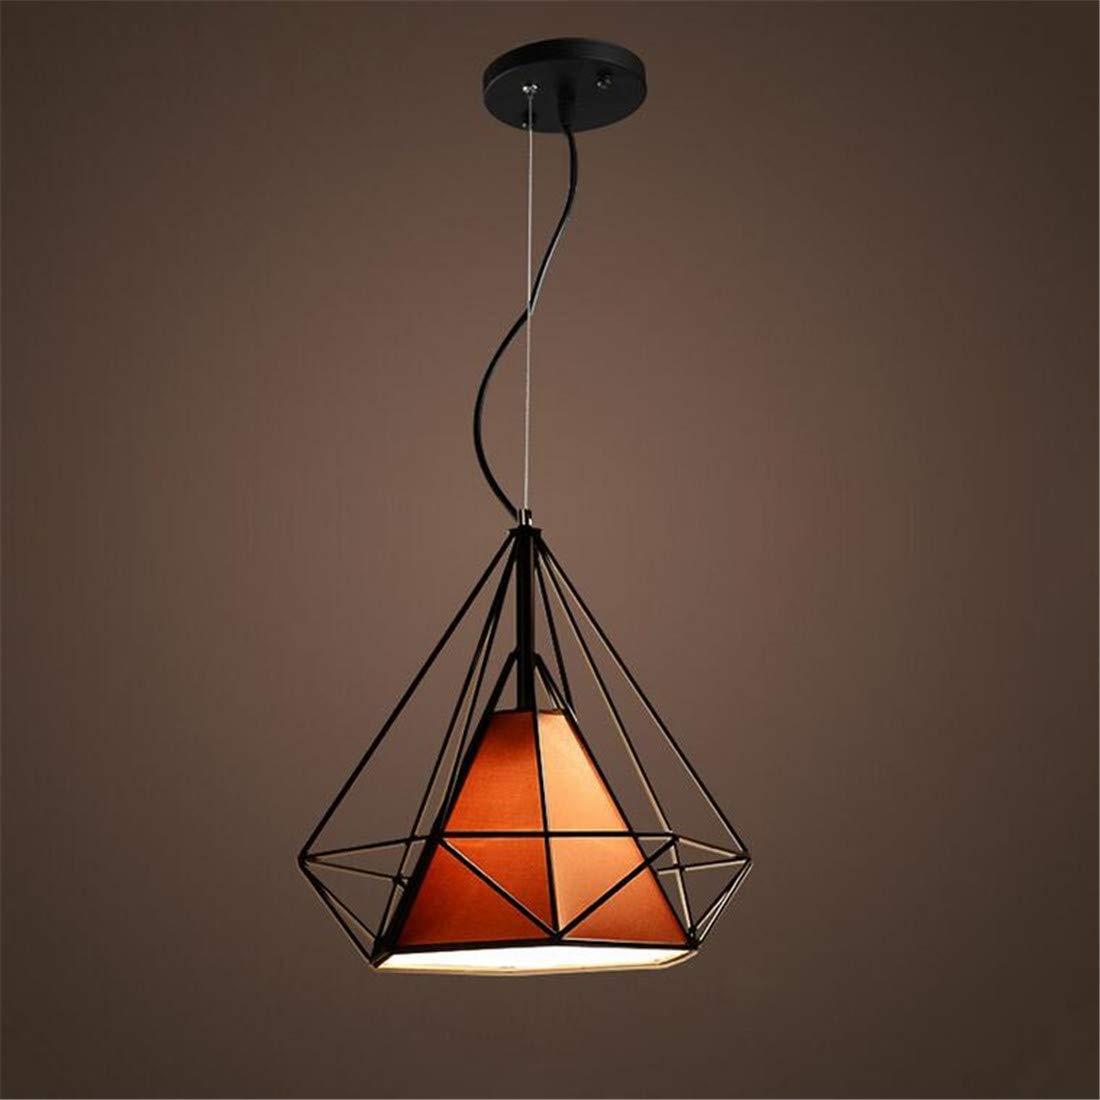 Led-leuchten Led-leuchten Led-leuchten Edison Lights Moderne ...